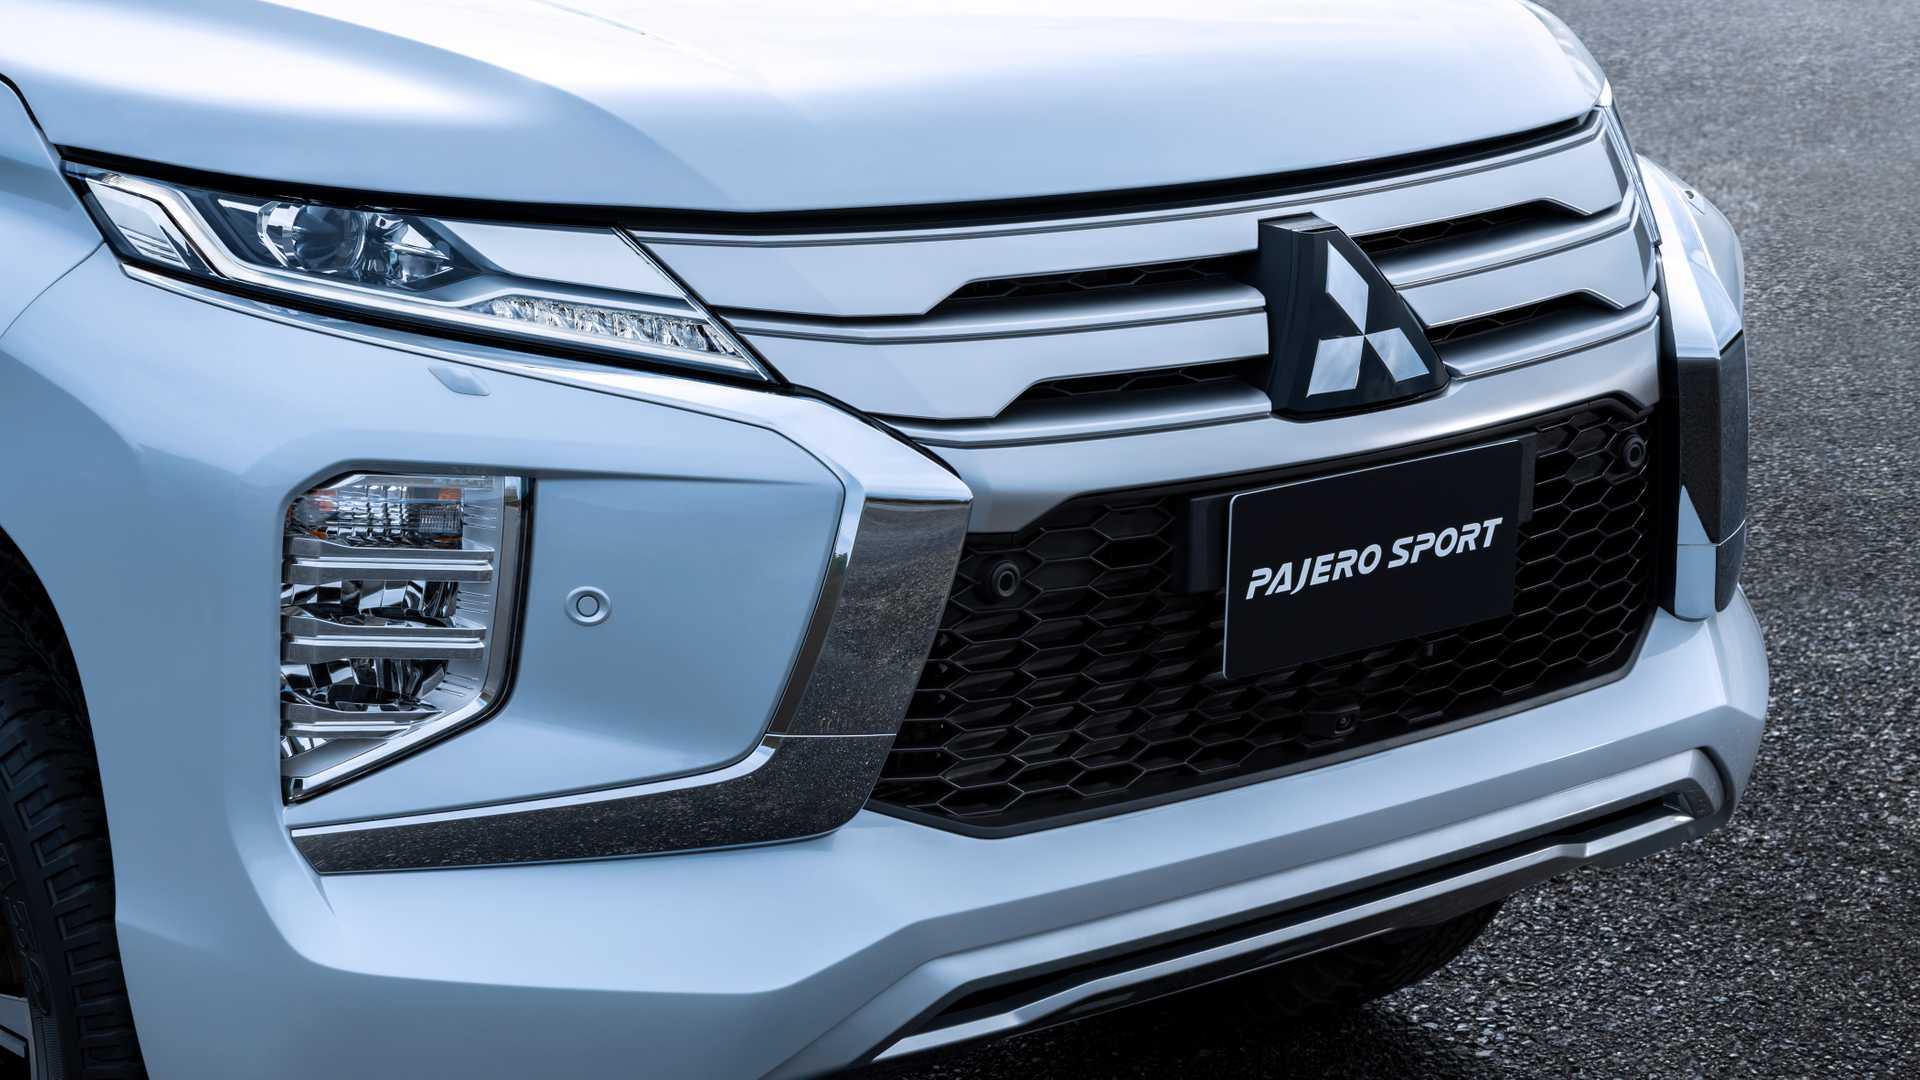 2020_Mitsubishi_Pajero_Sport_facelift_0024